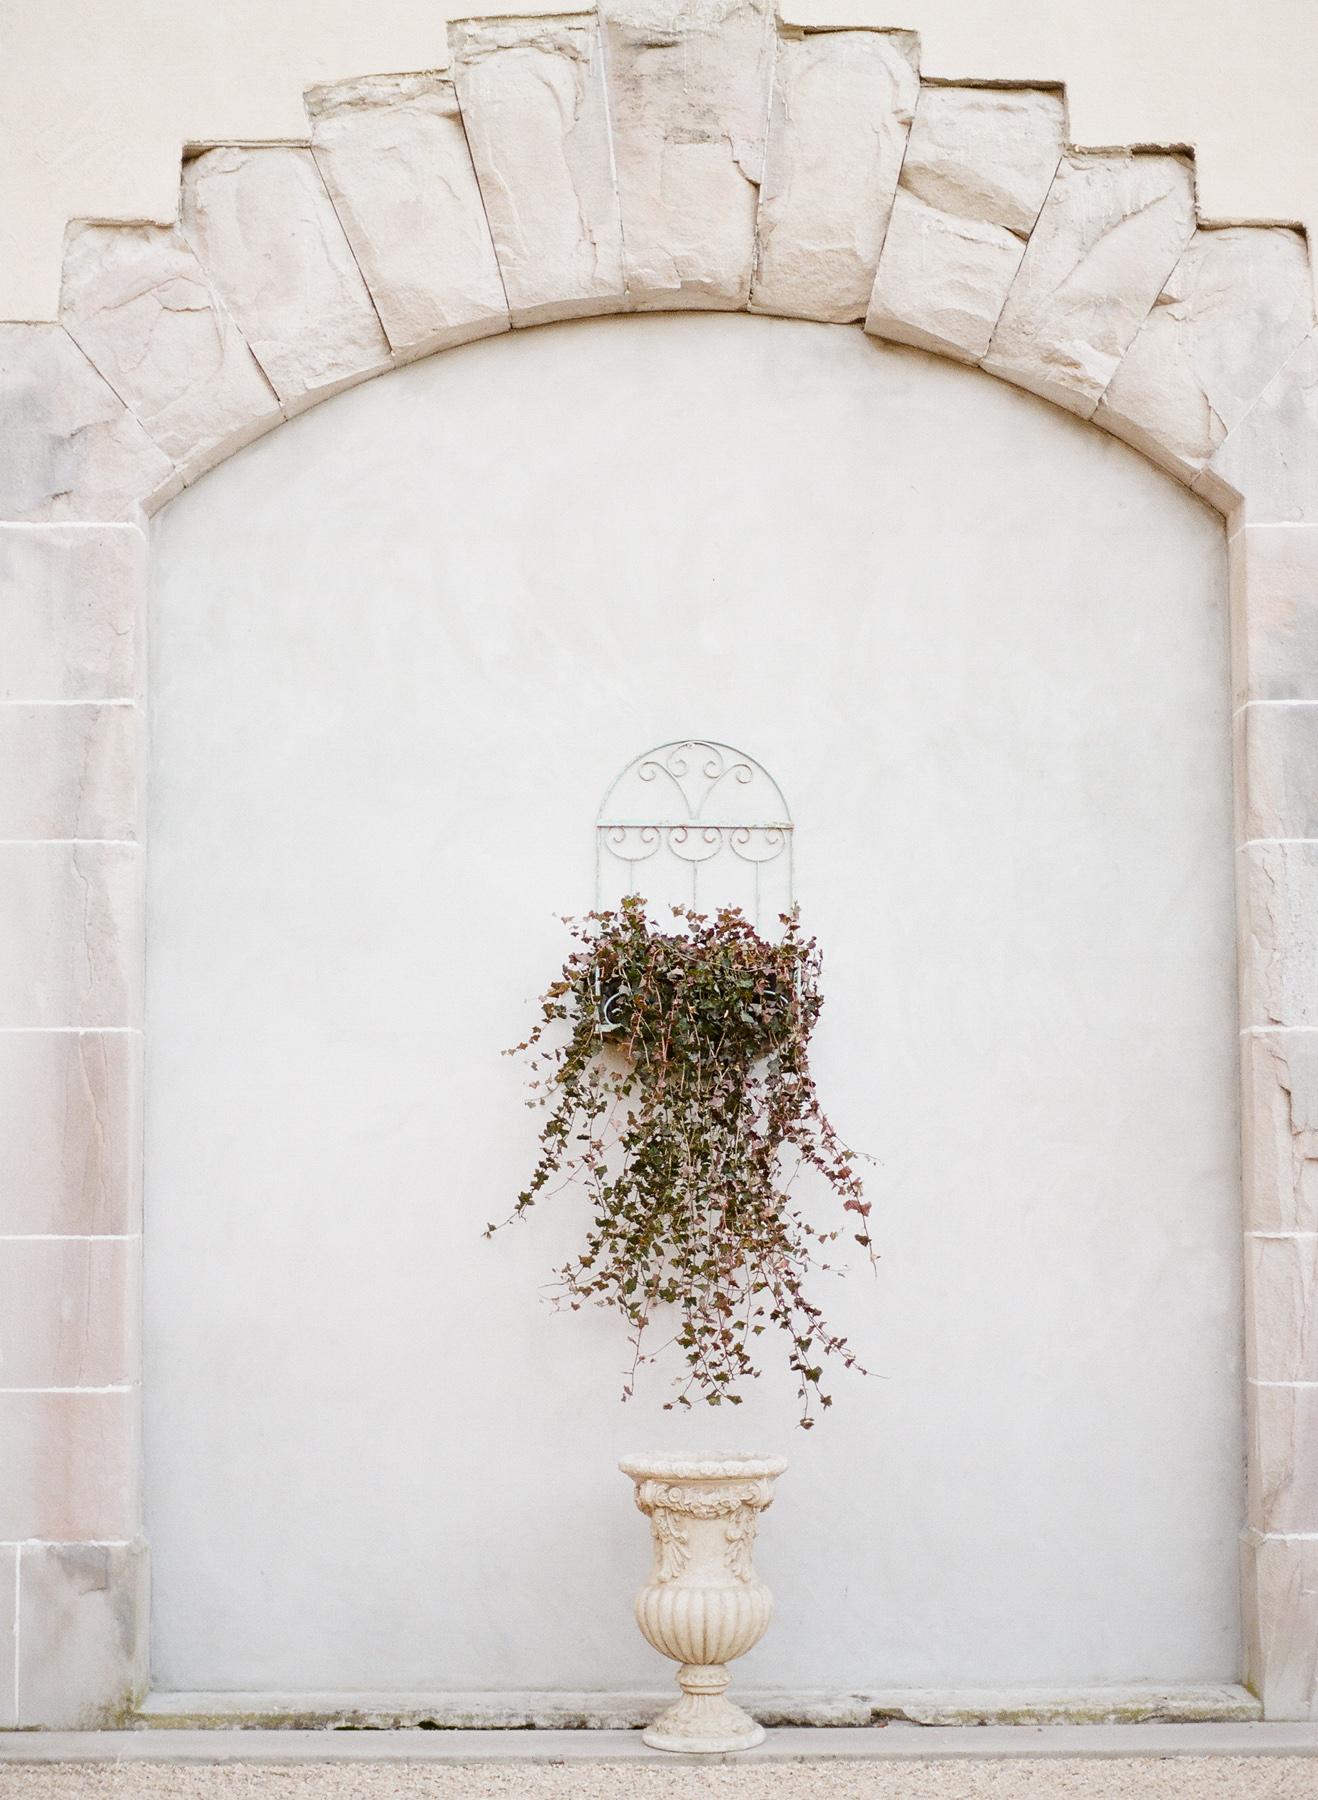 Brian-McKnight-wedding-oheka-castle-003.jpg